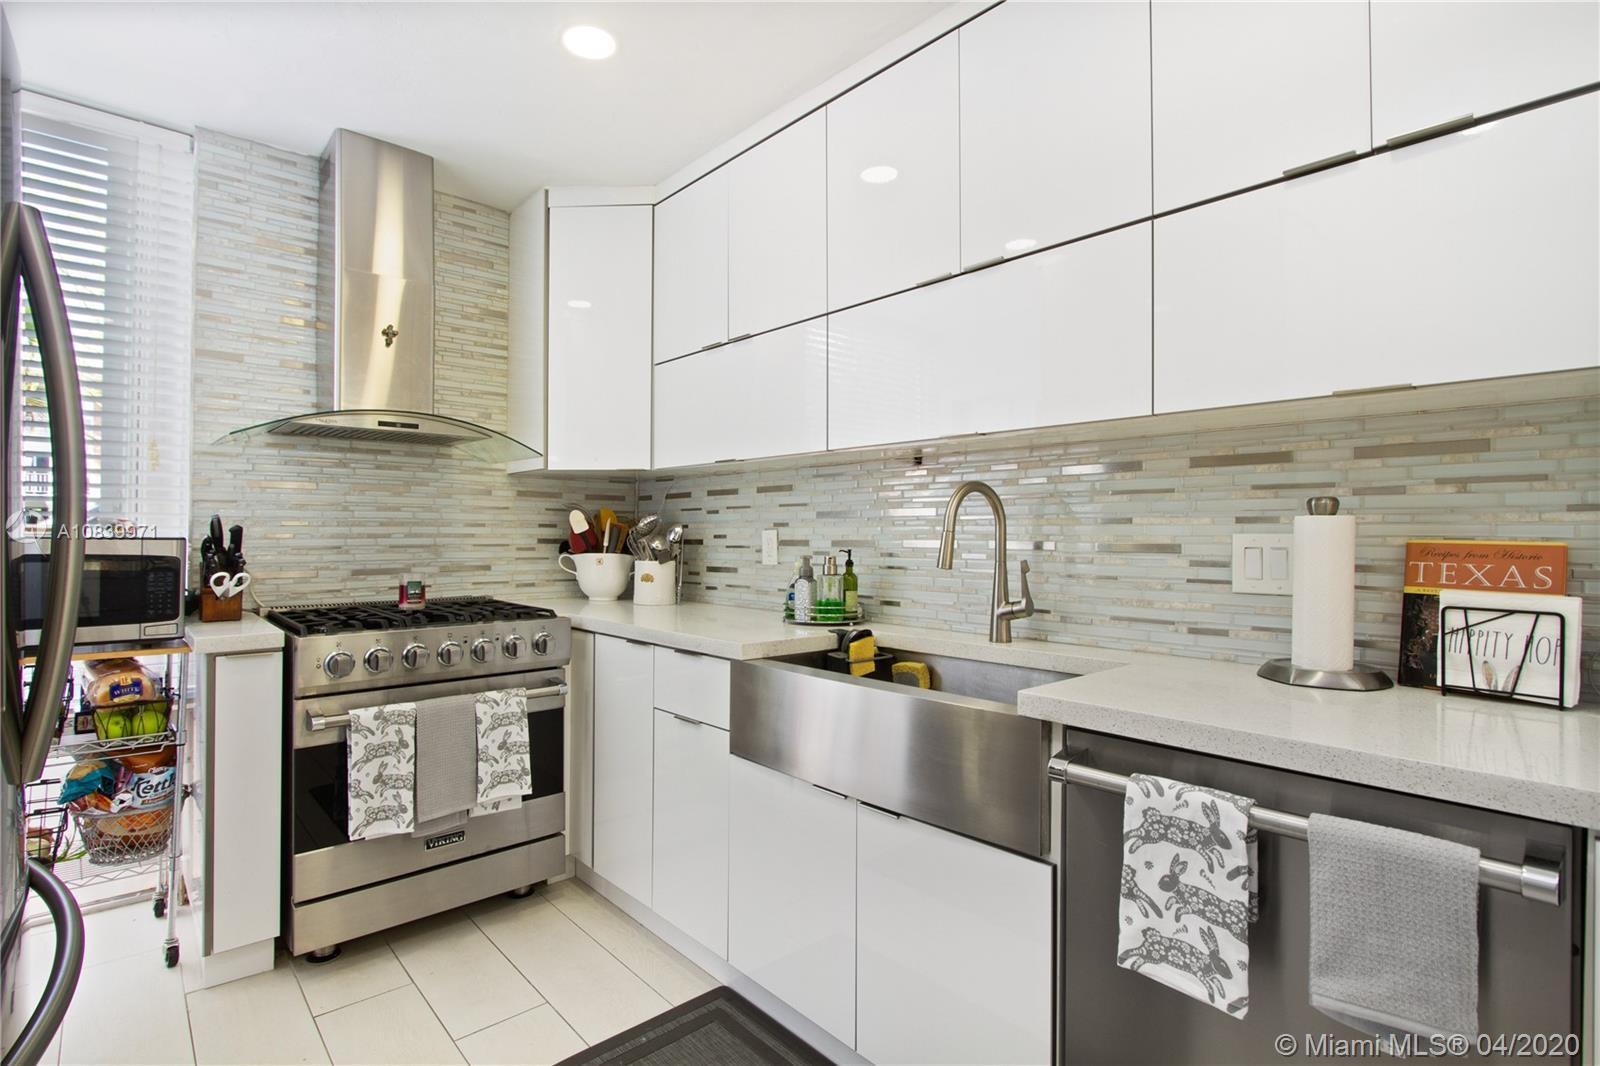 6720 N Brookline Dr #6720, Hialeah, FL 33015 - Hialeah, FL real estate listing